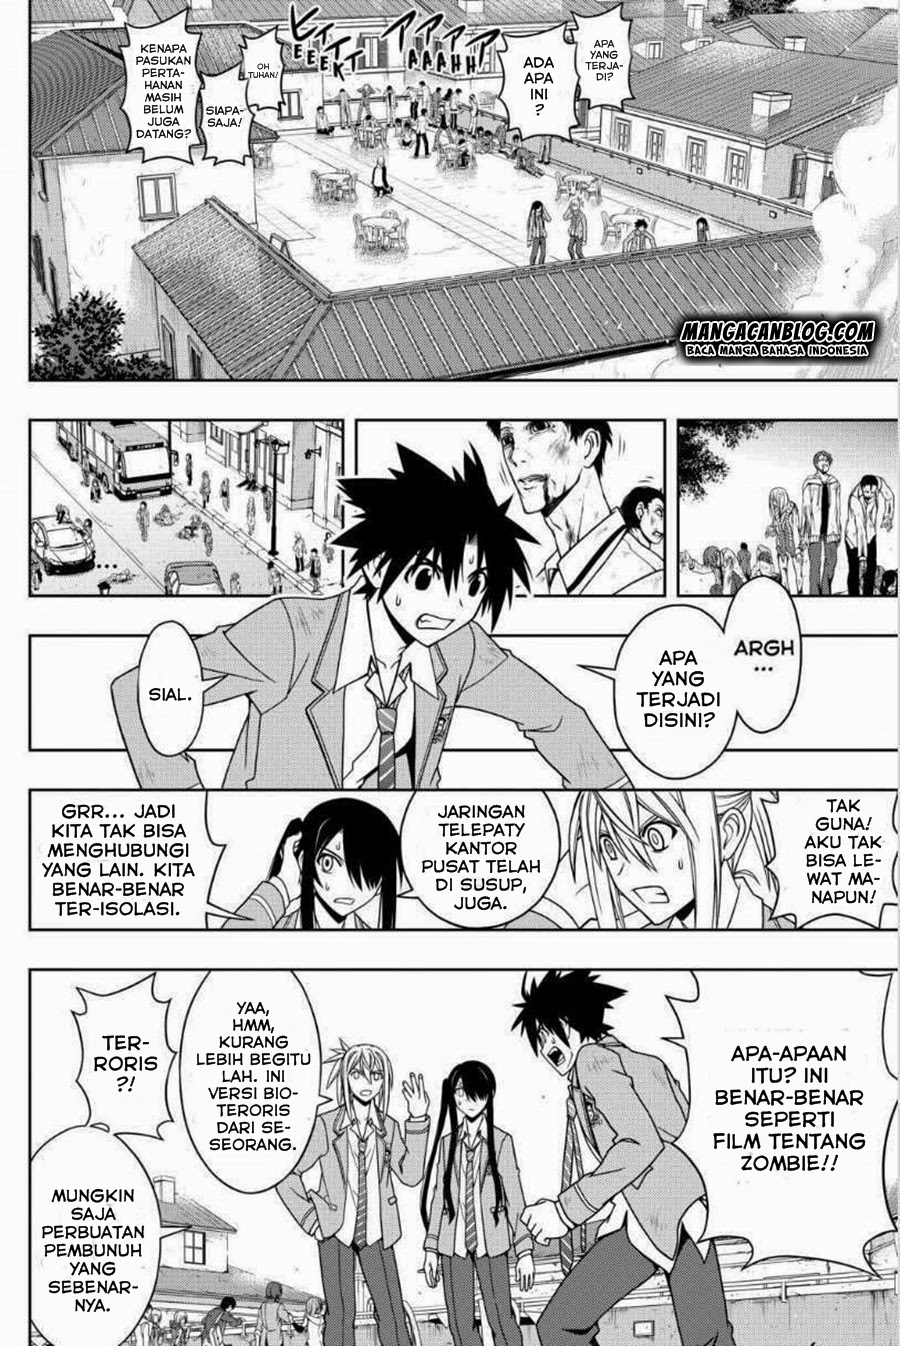 Komik uq holder 053 - buat latihan 54 Indonesia uq holder 053 - buat latihan Terbaru 6|Baca Manga Komik Indonesia